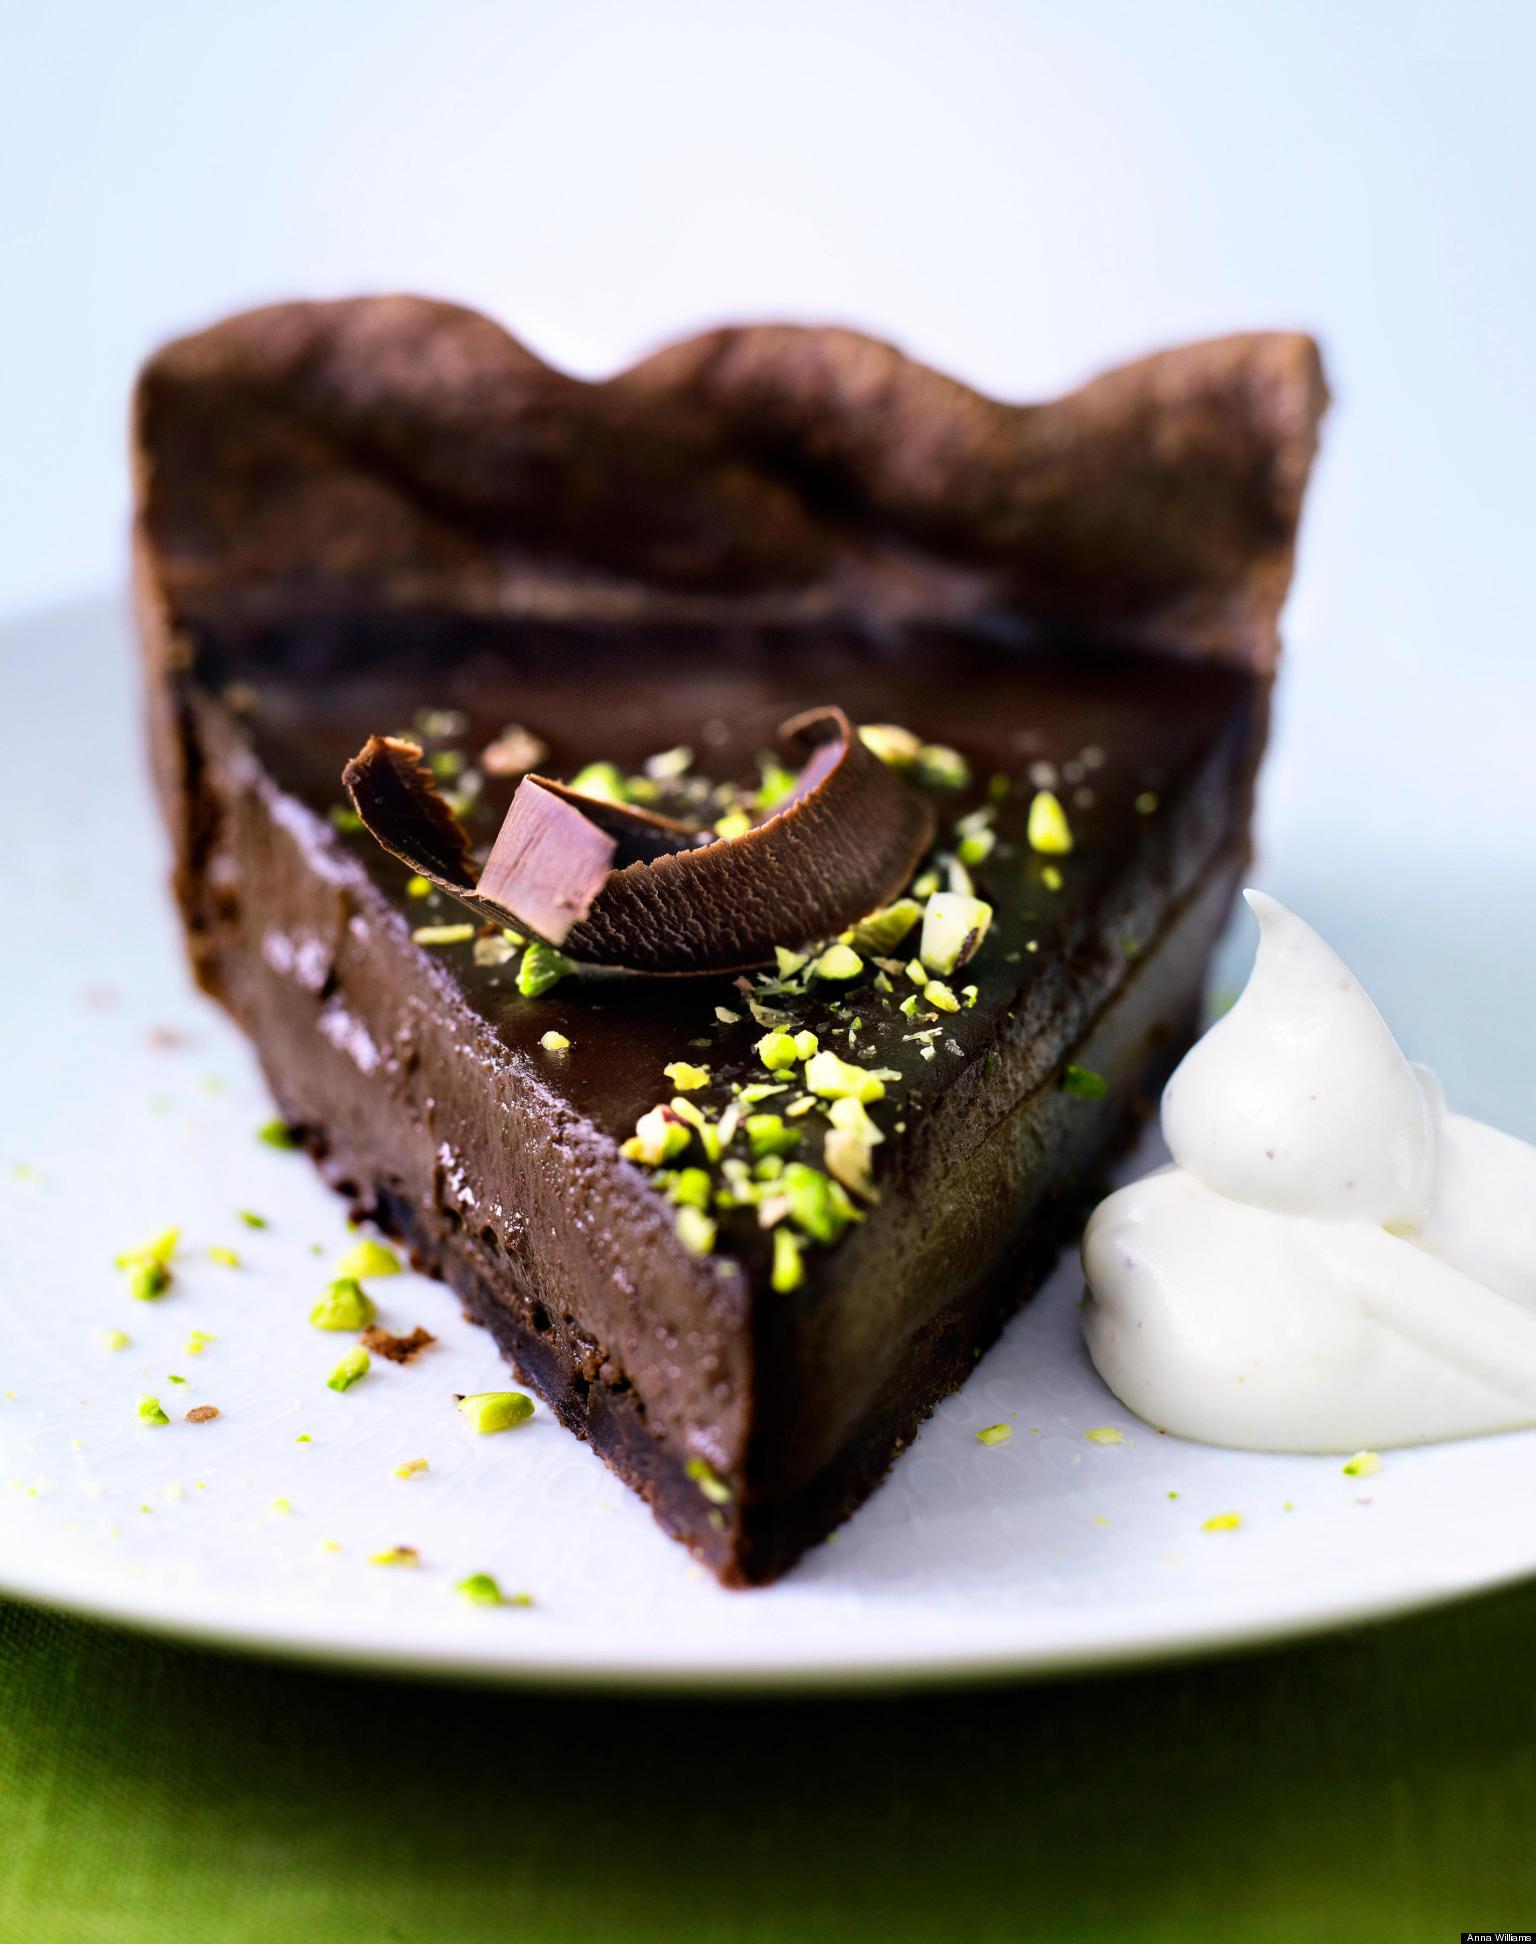 Chocolate Dessert Ideas  Best Chocolate Dessert Recipes The Most Decadent Desserts